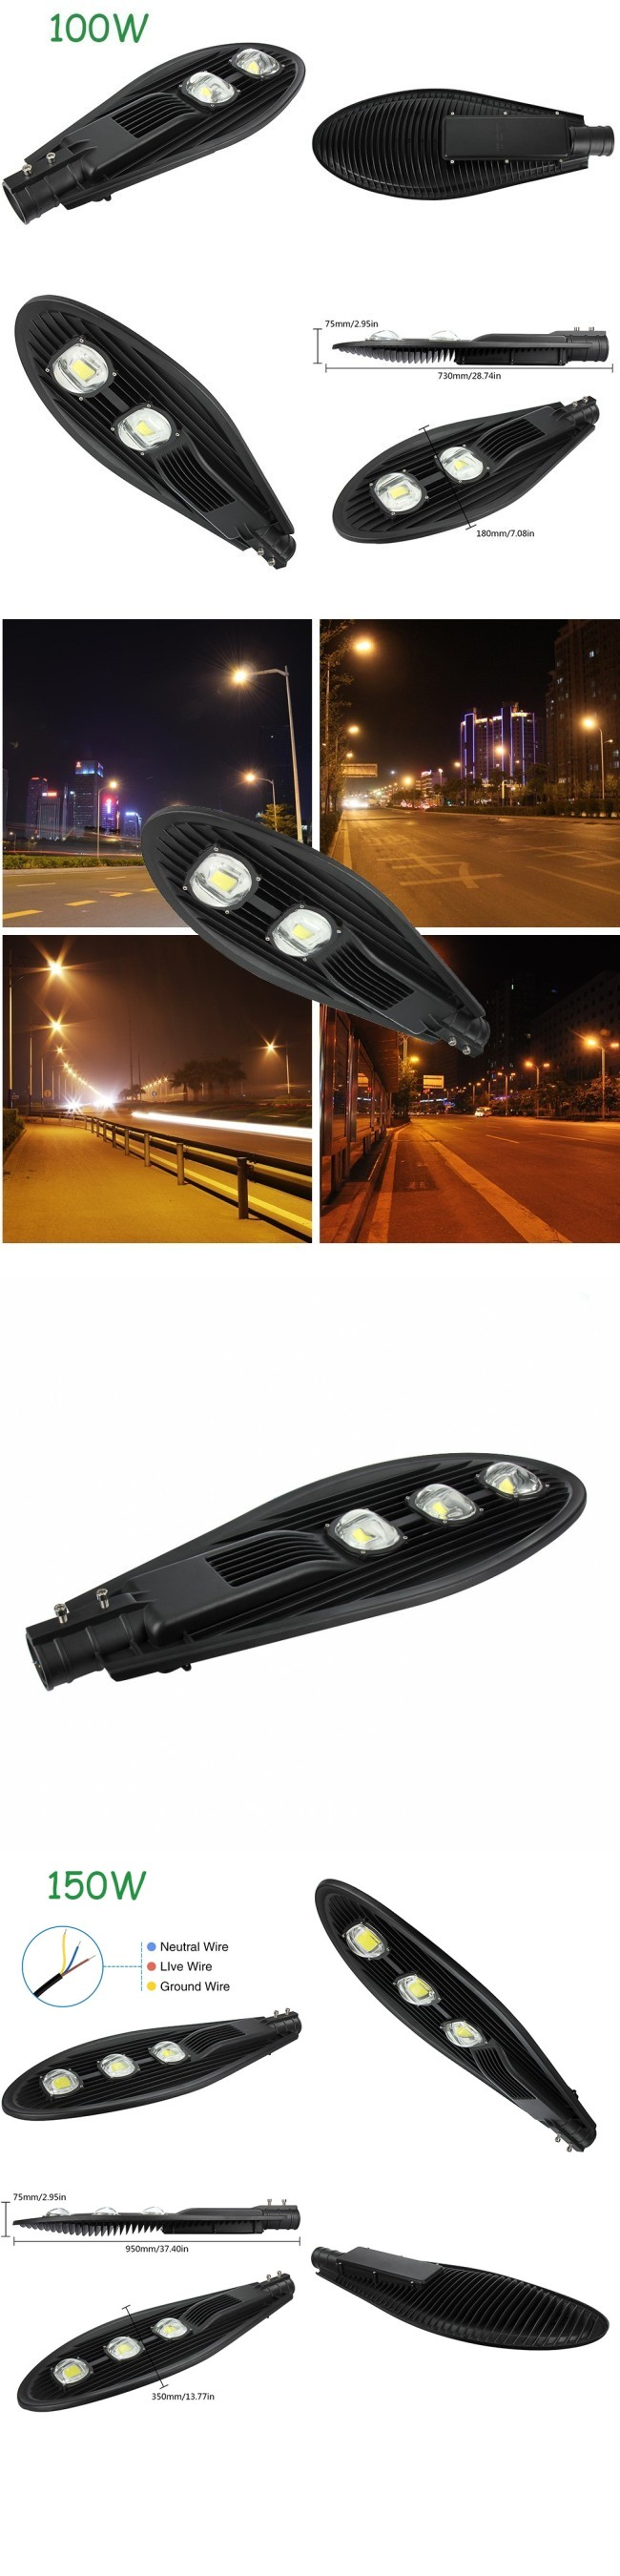 High Quality 40W LED Street Lighting Solar Street Lamp IP65